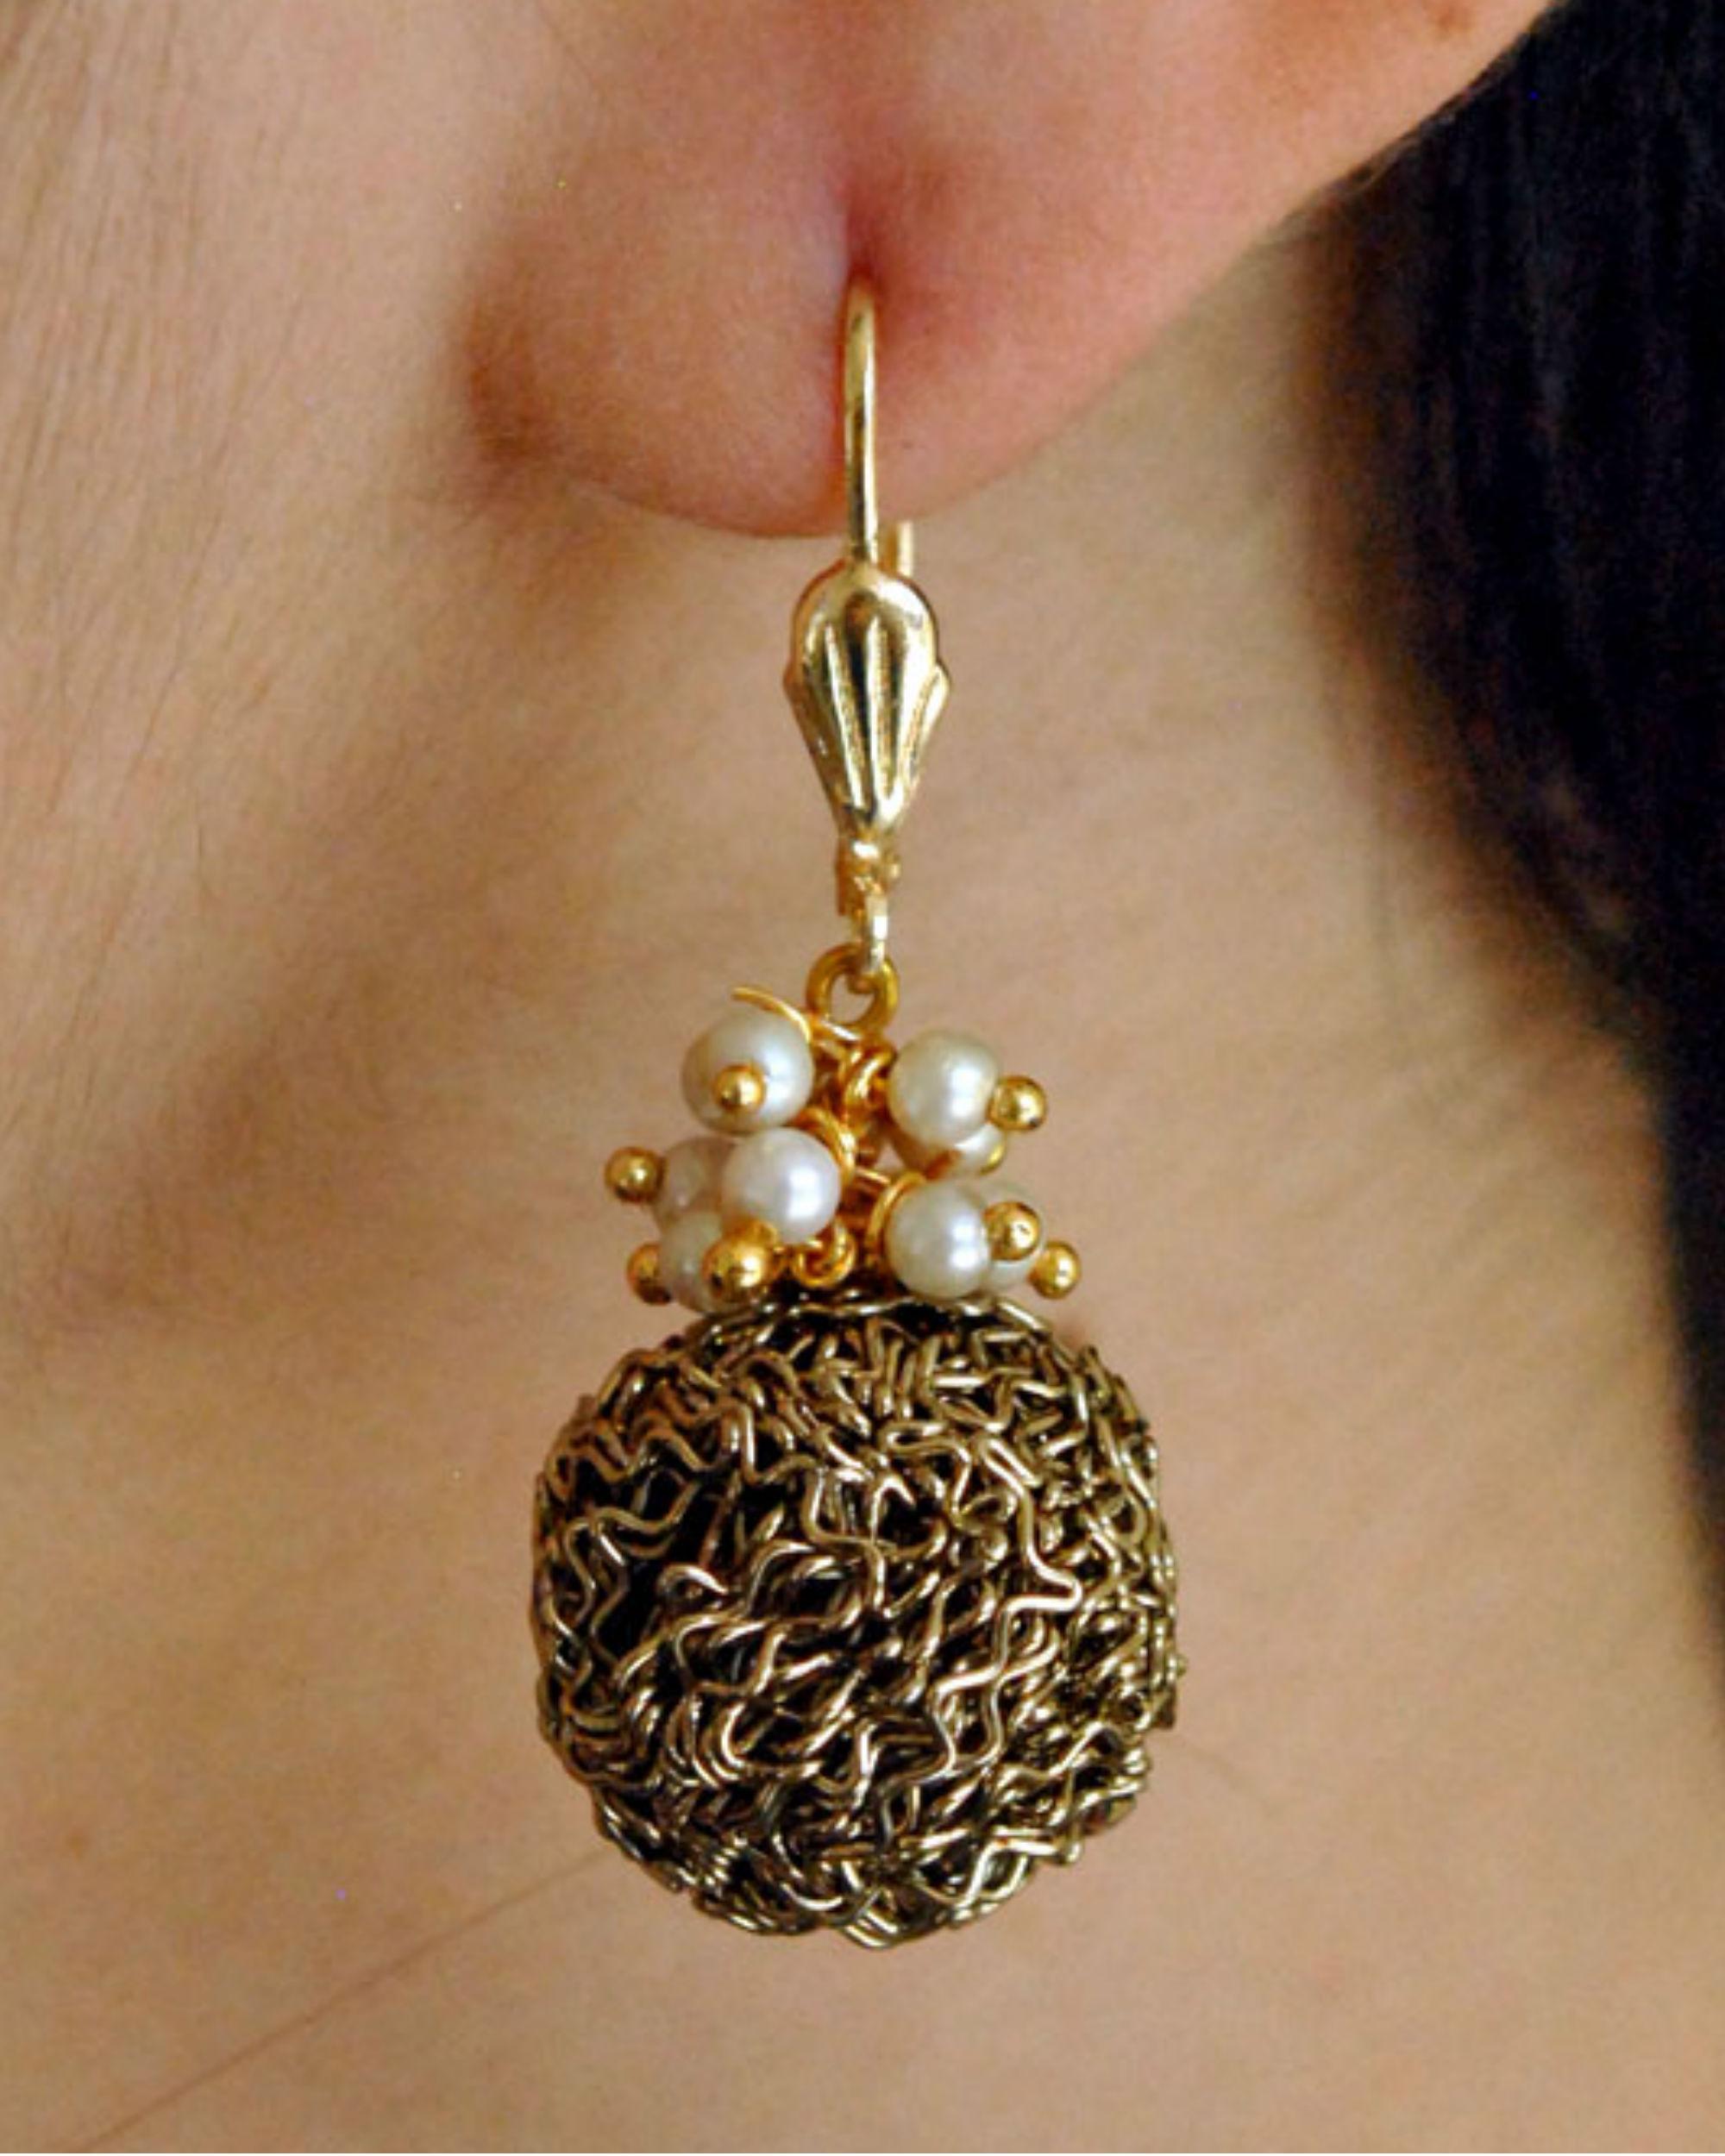 Mesh ball pearl earrings